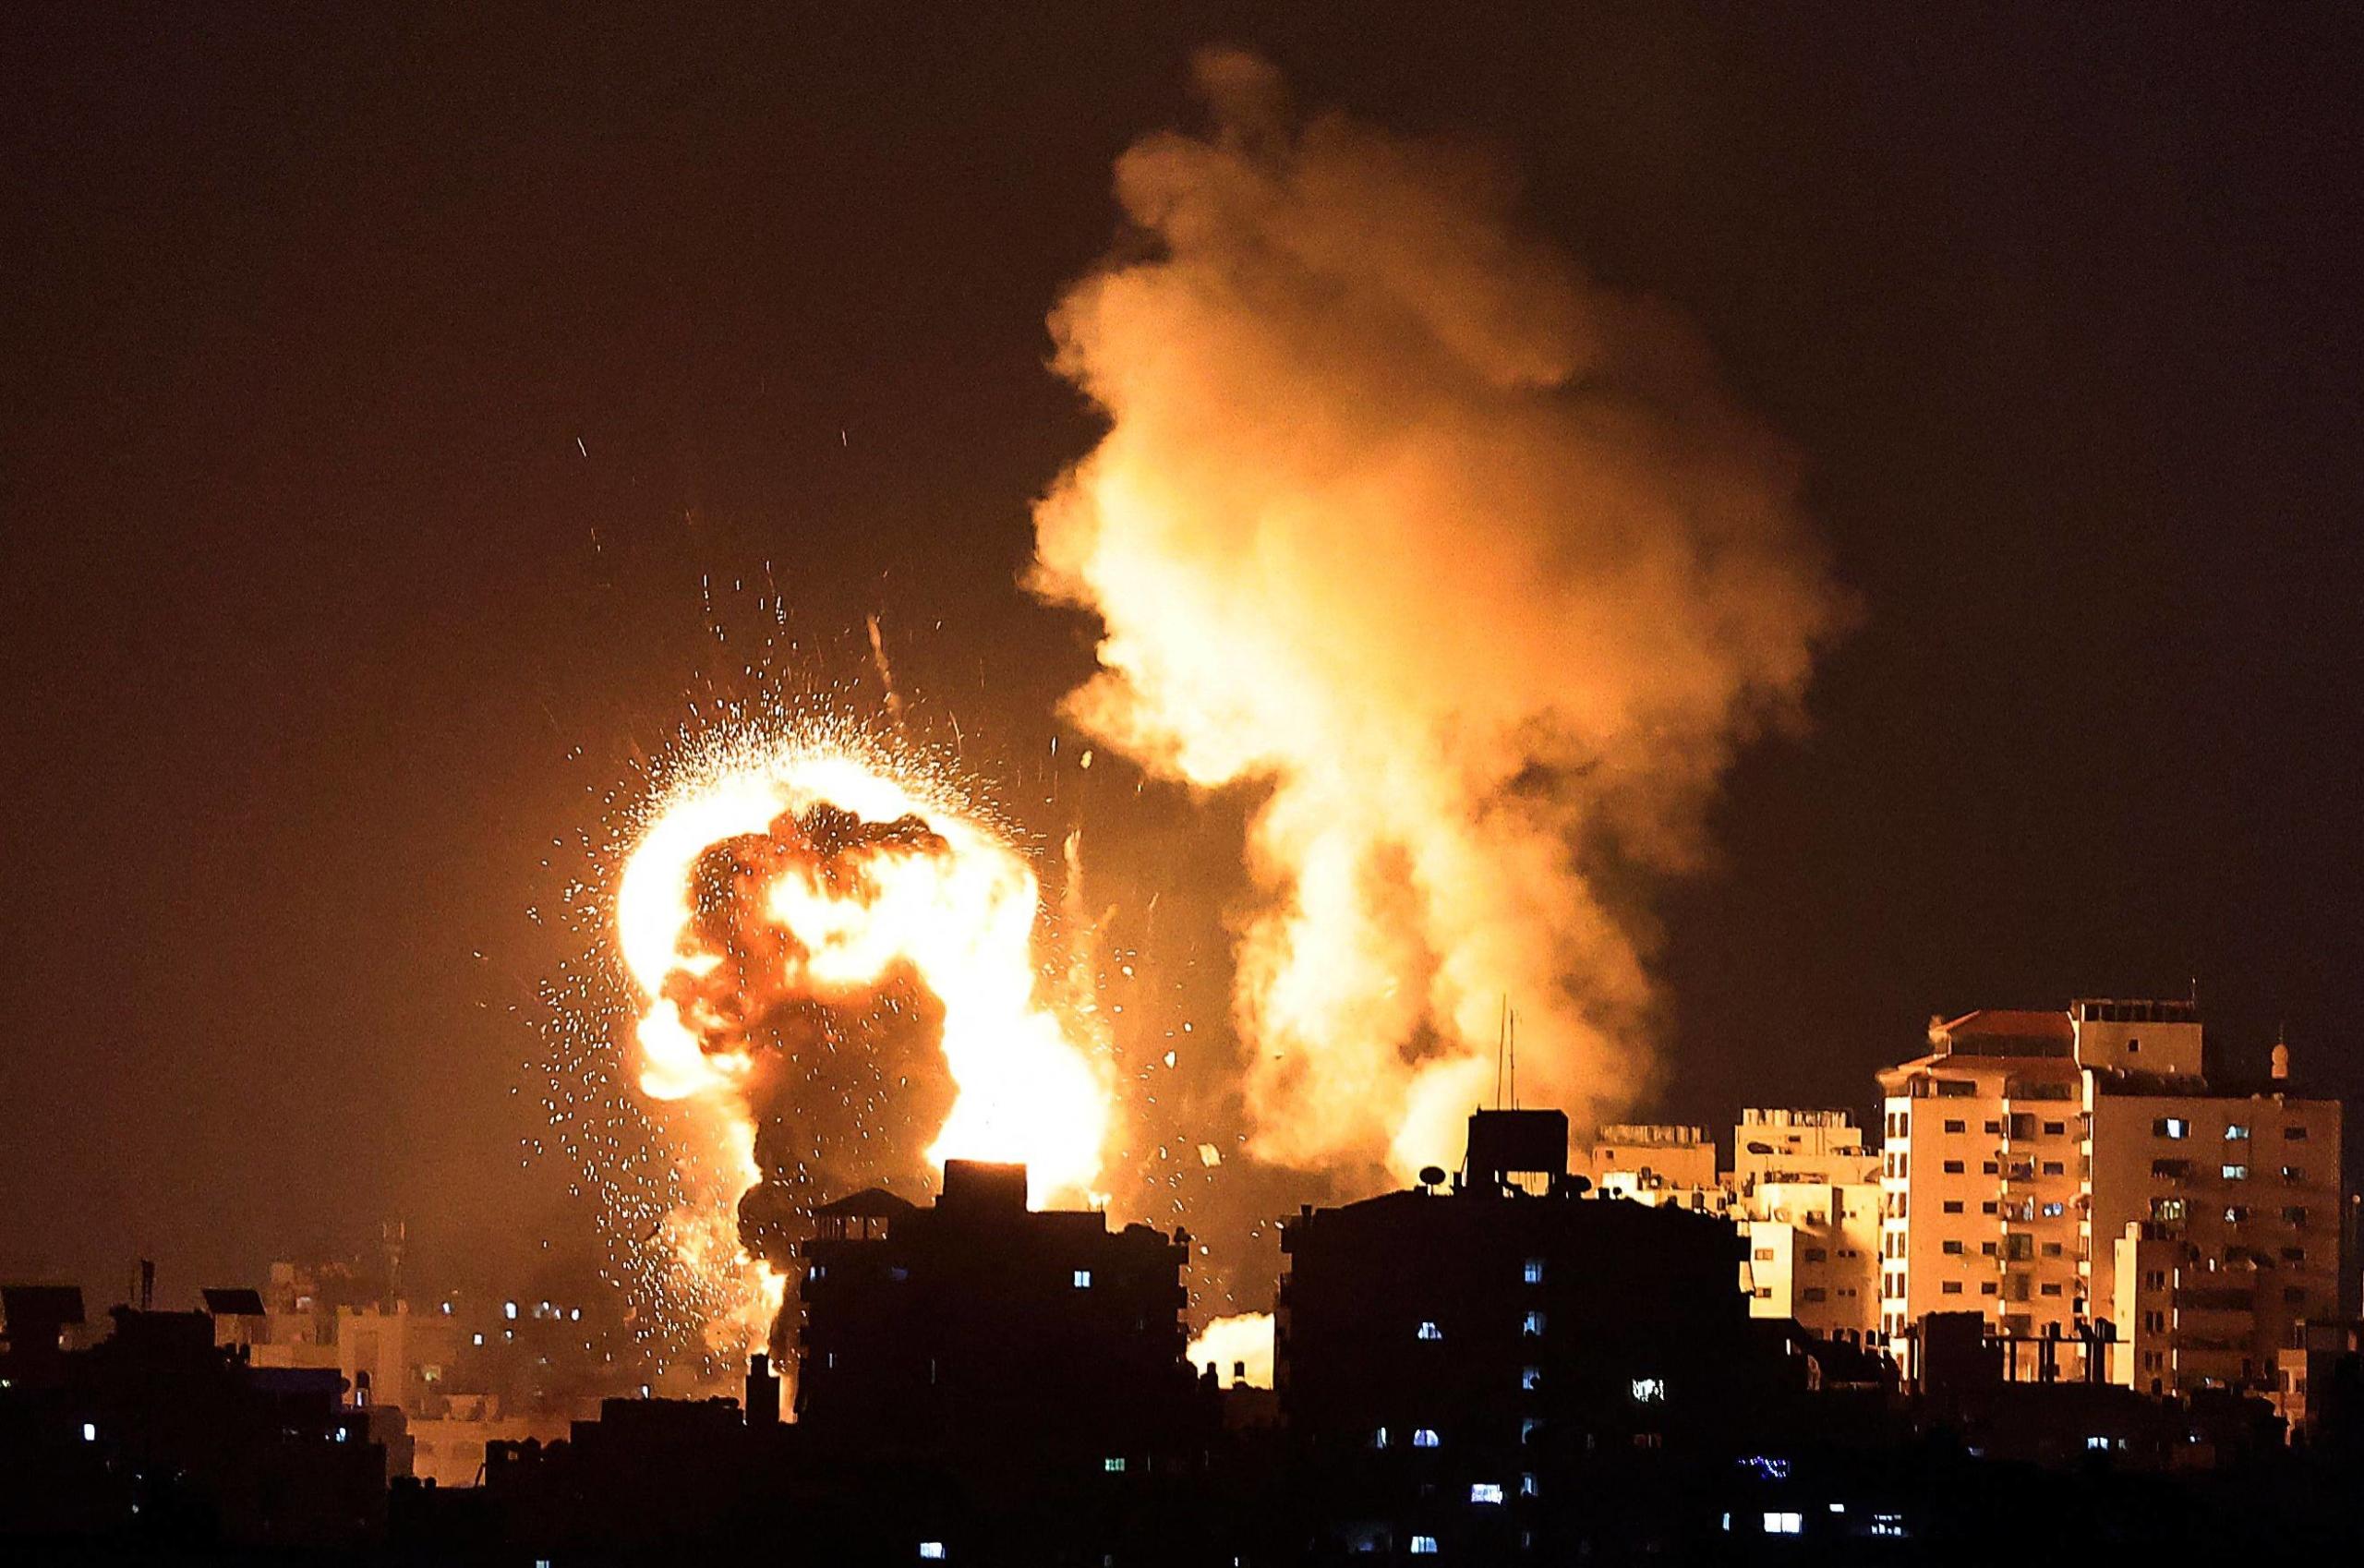 Twenty martyred as Israel strikes Gaza after Hamas rocket barrage